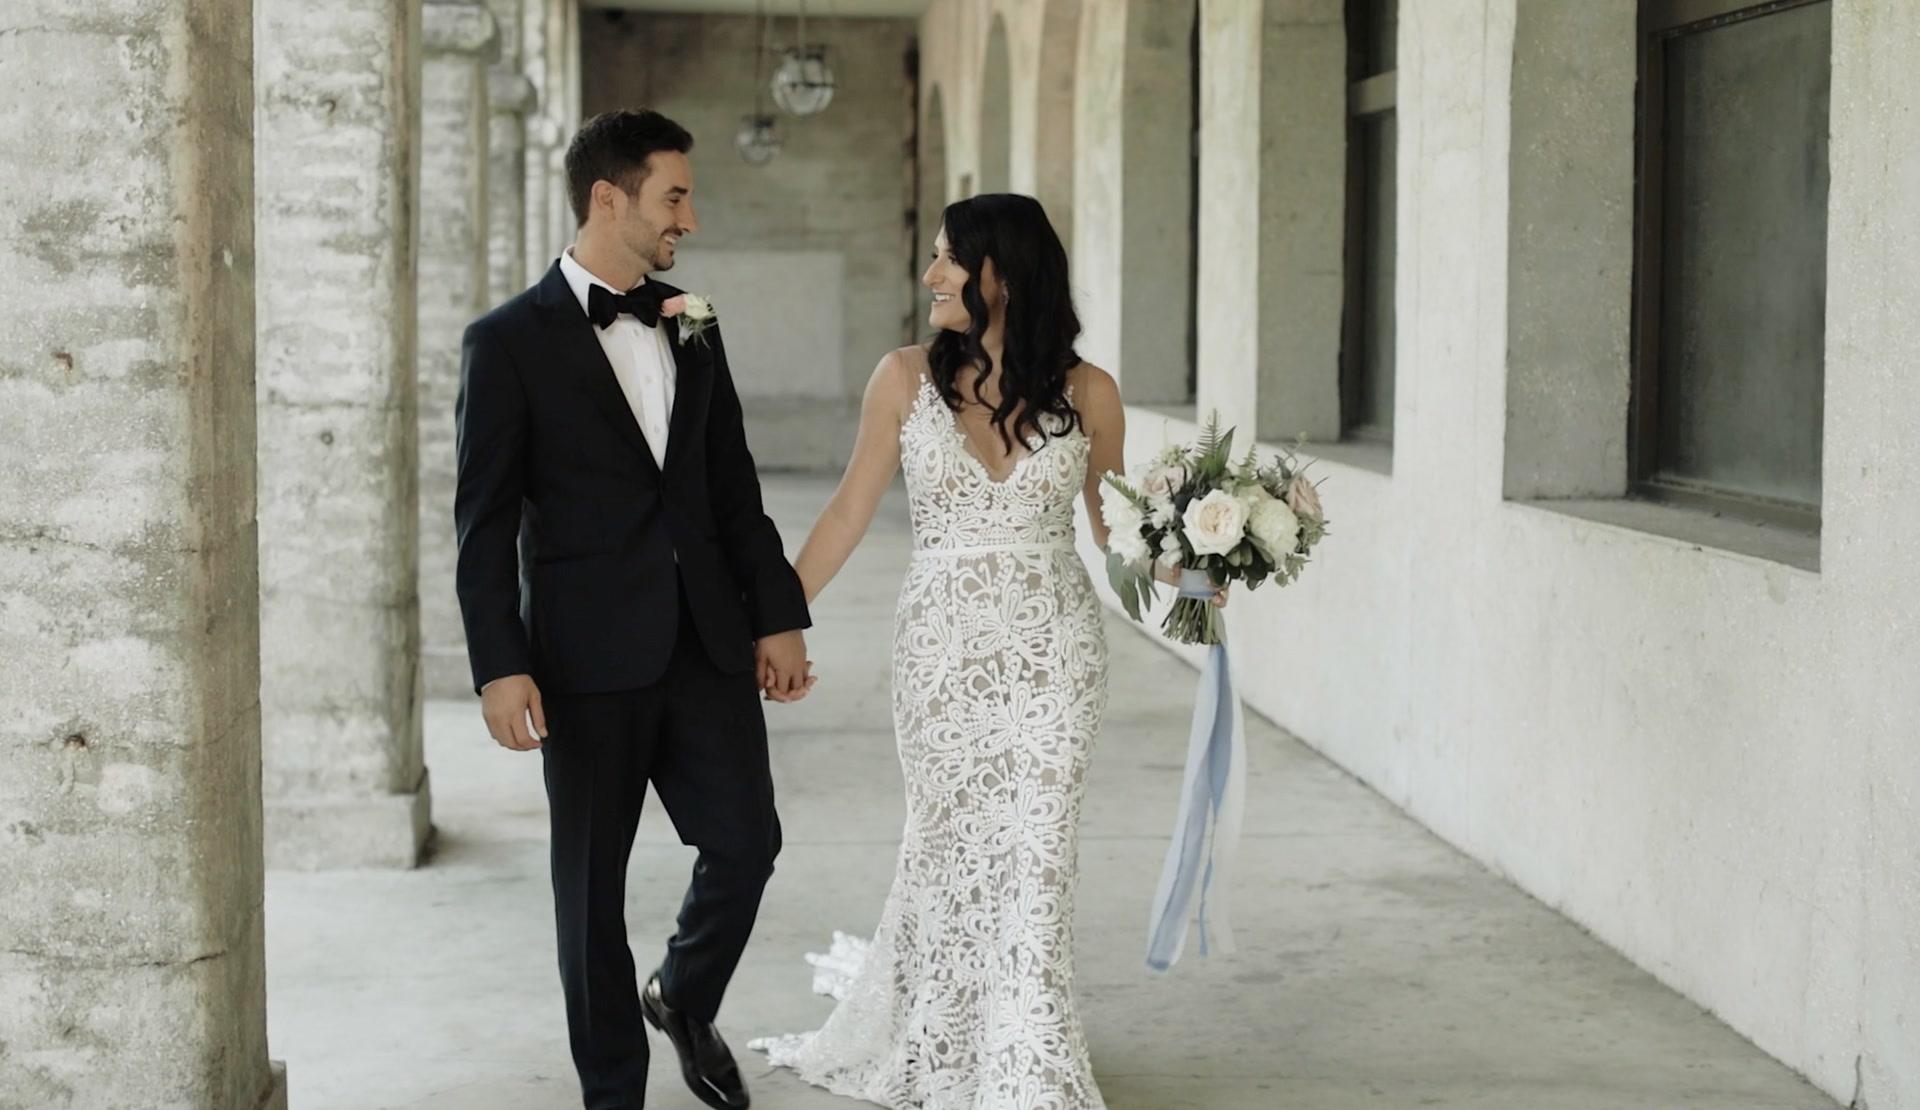 Randa + Jesse | St. Augustine, Florida | The White Room